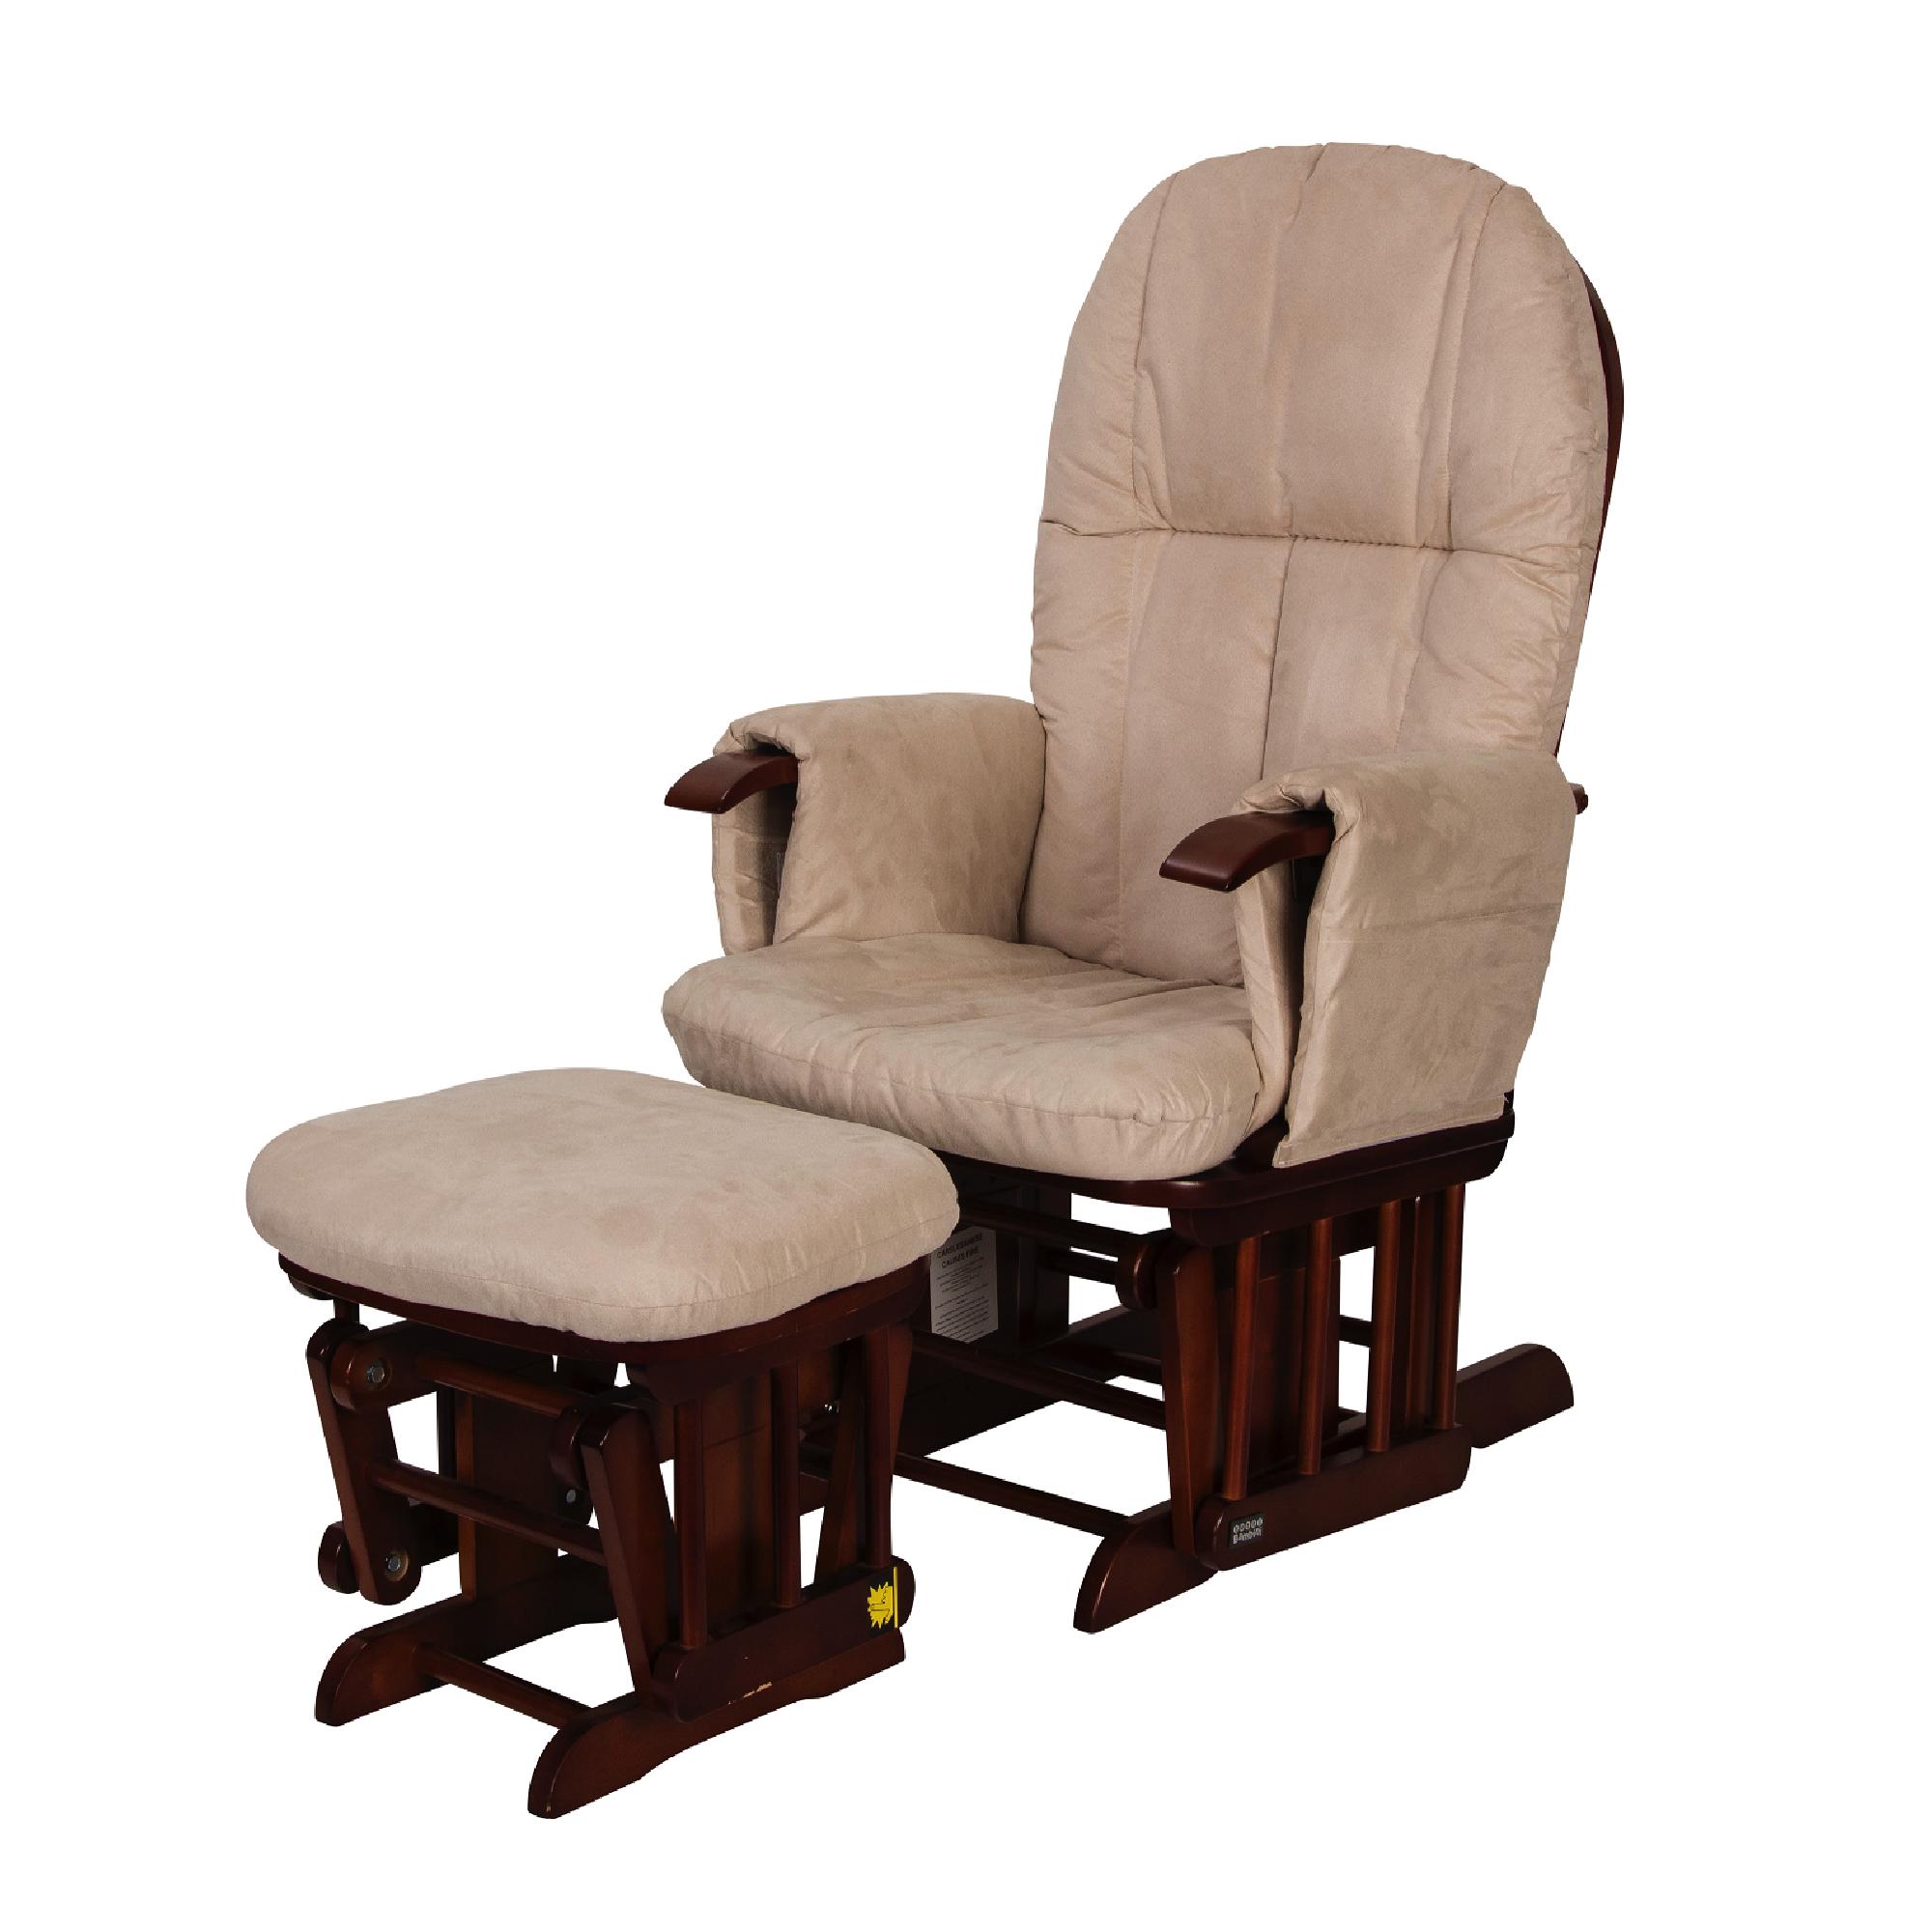 Strange Tutti Bambini Reclining Glider Chair Stool Walnut With Cream Cushions Ncnpc Chair Design For Home Ncnpcorg